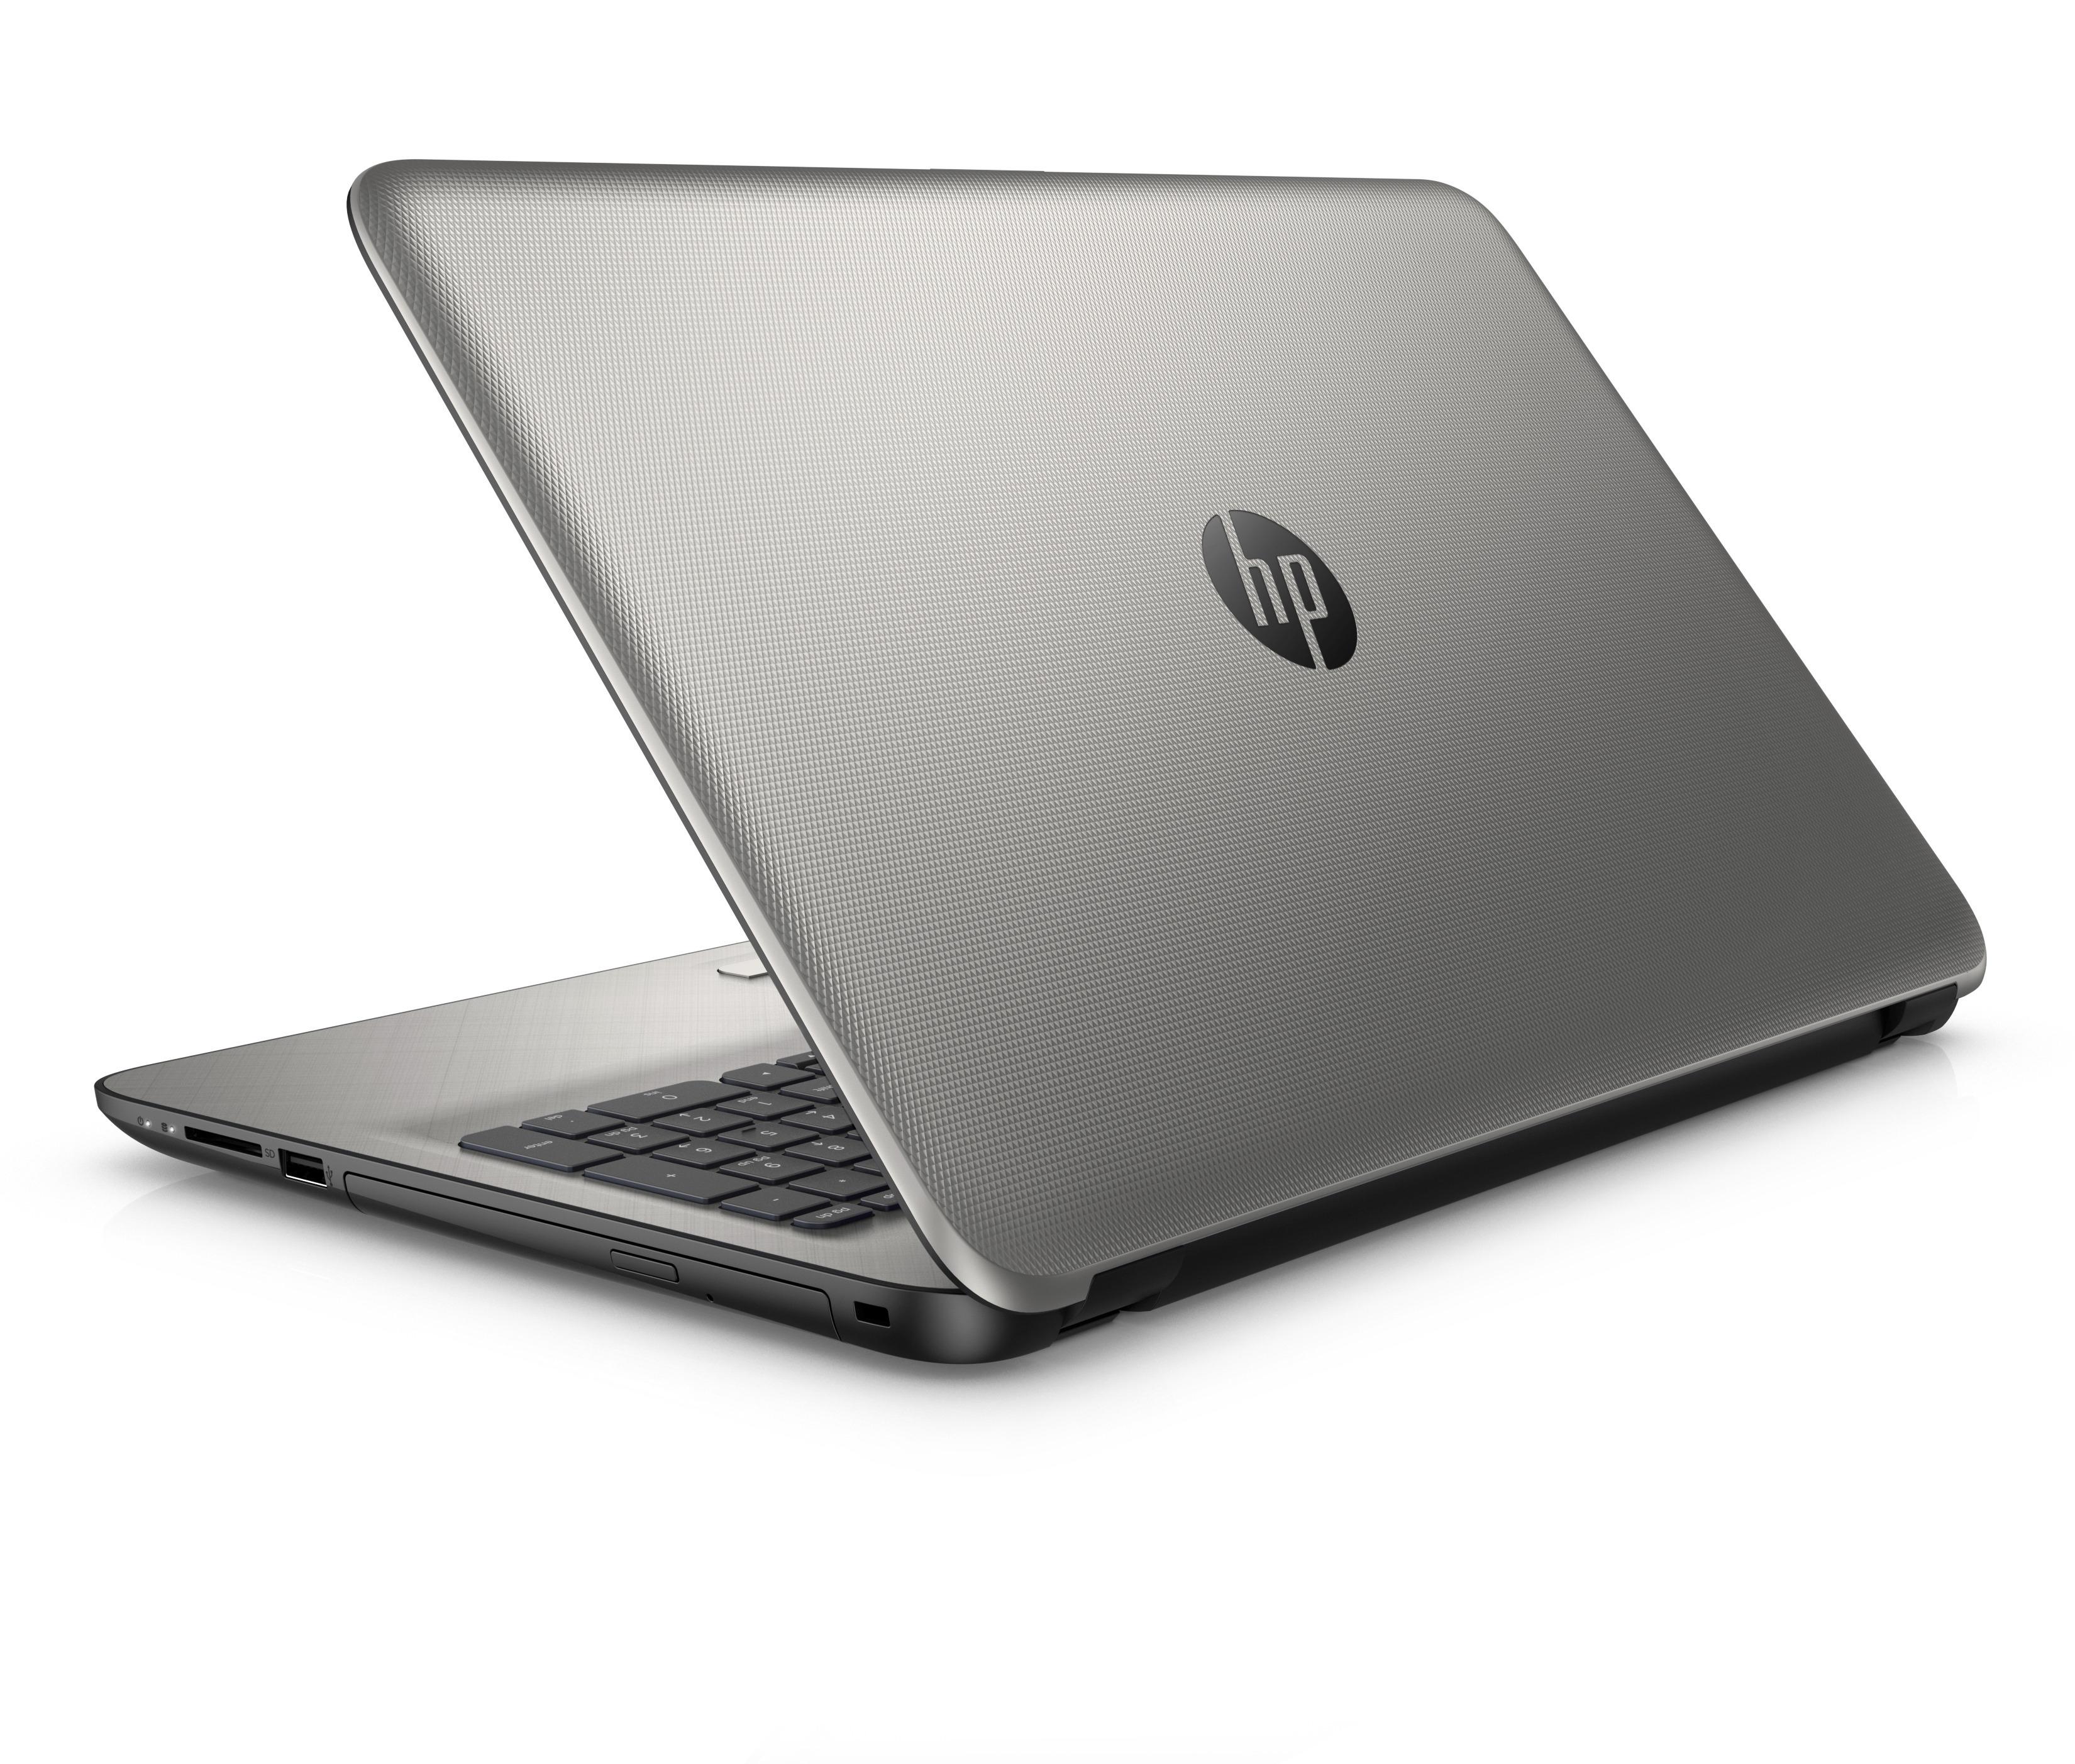 "HP 15-ac137ur 1.7GHz i5-4210U 15.6"" 1366 x 768Pixel Nero, Argento Computer portatile"